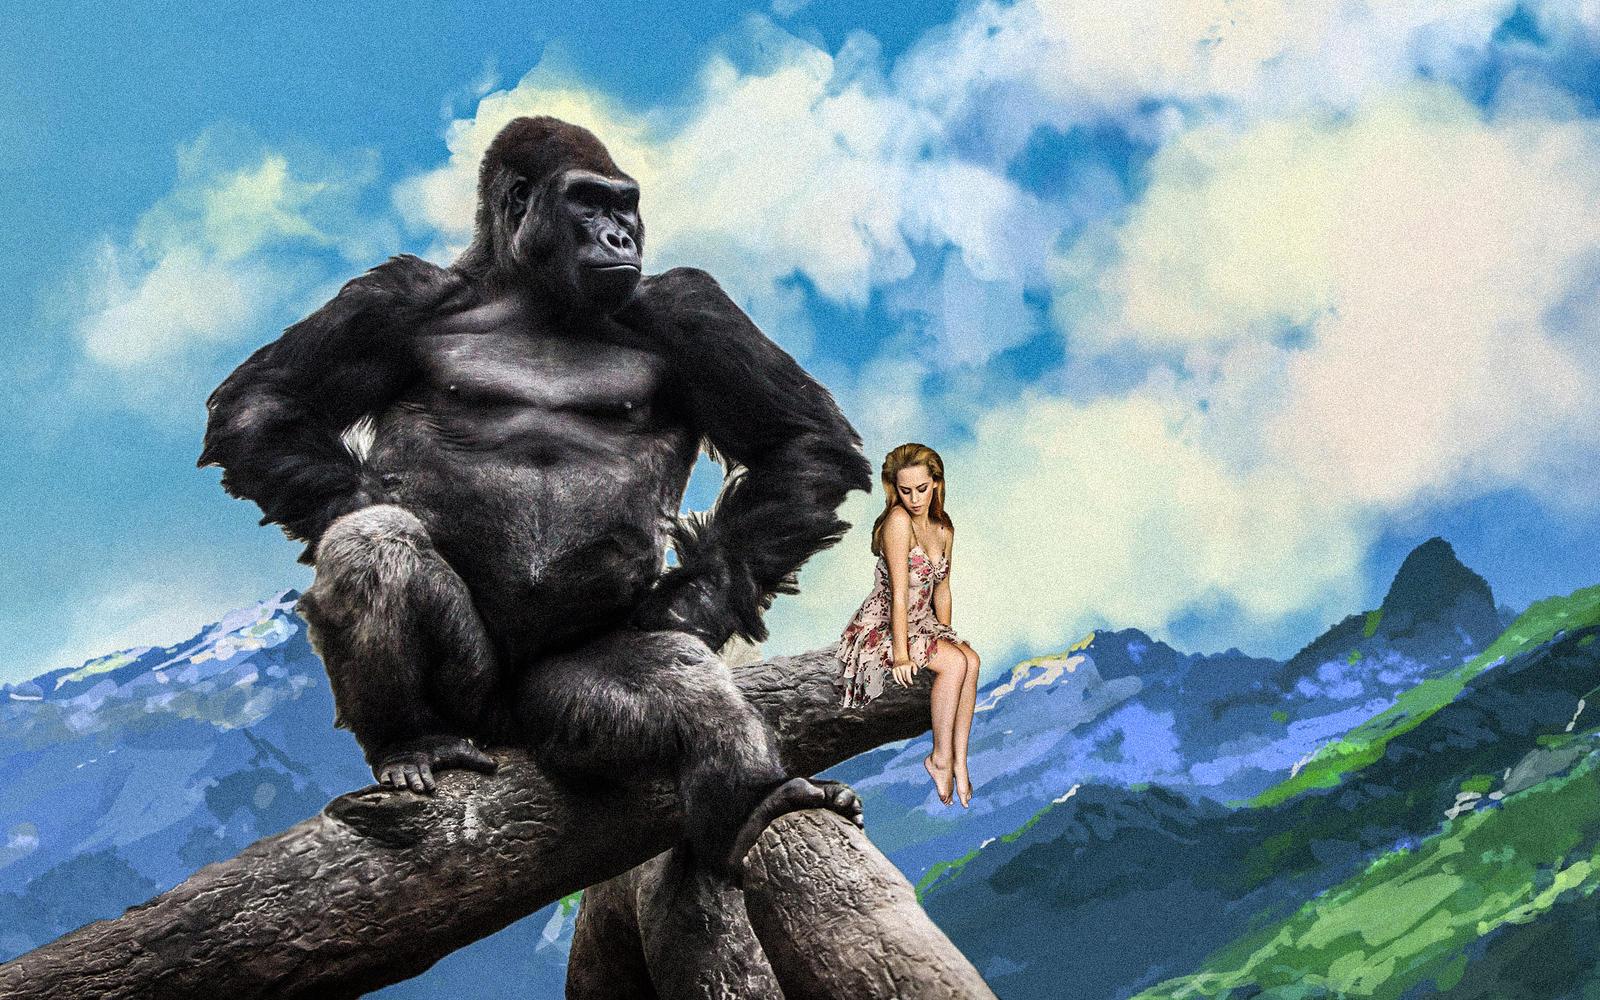 King Kong and I by VGRMEDIA